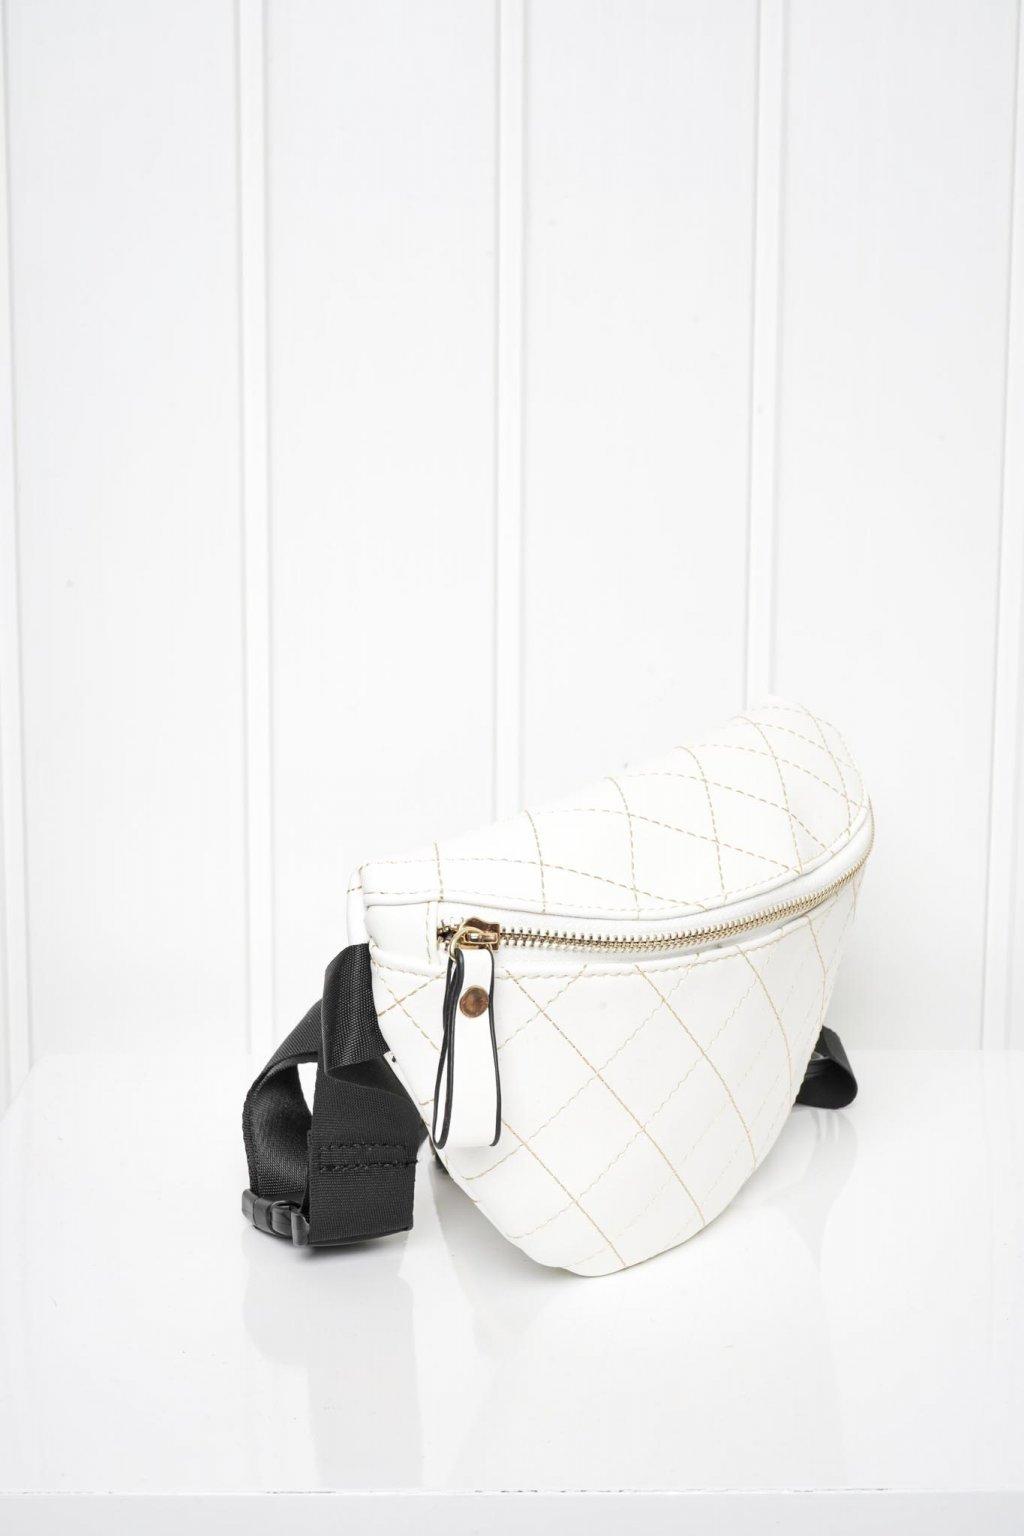 Kabelka, crossbody, ruksak, shopping bag, shopperka, 110